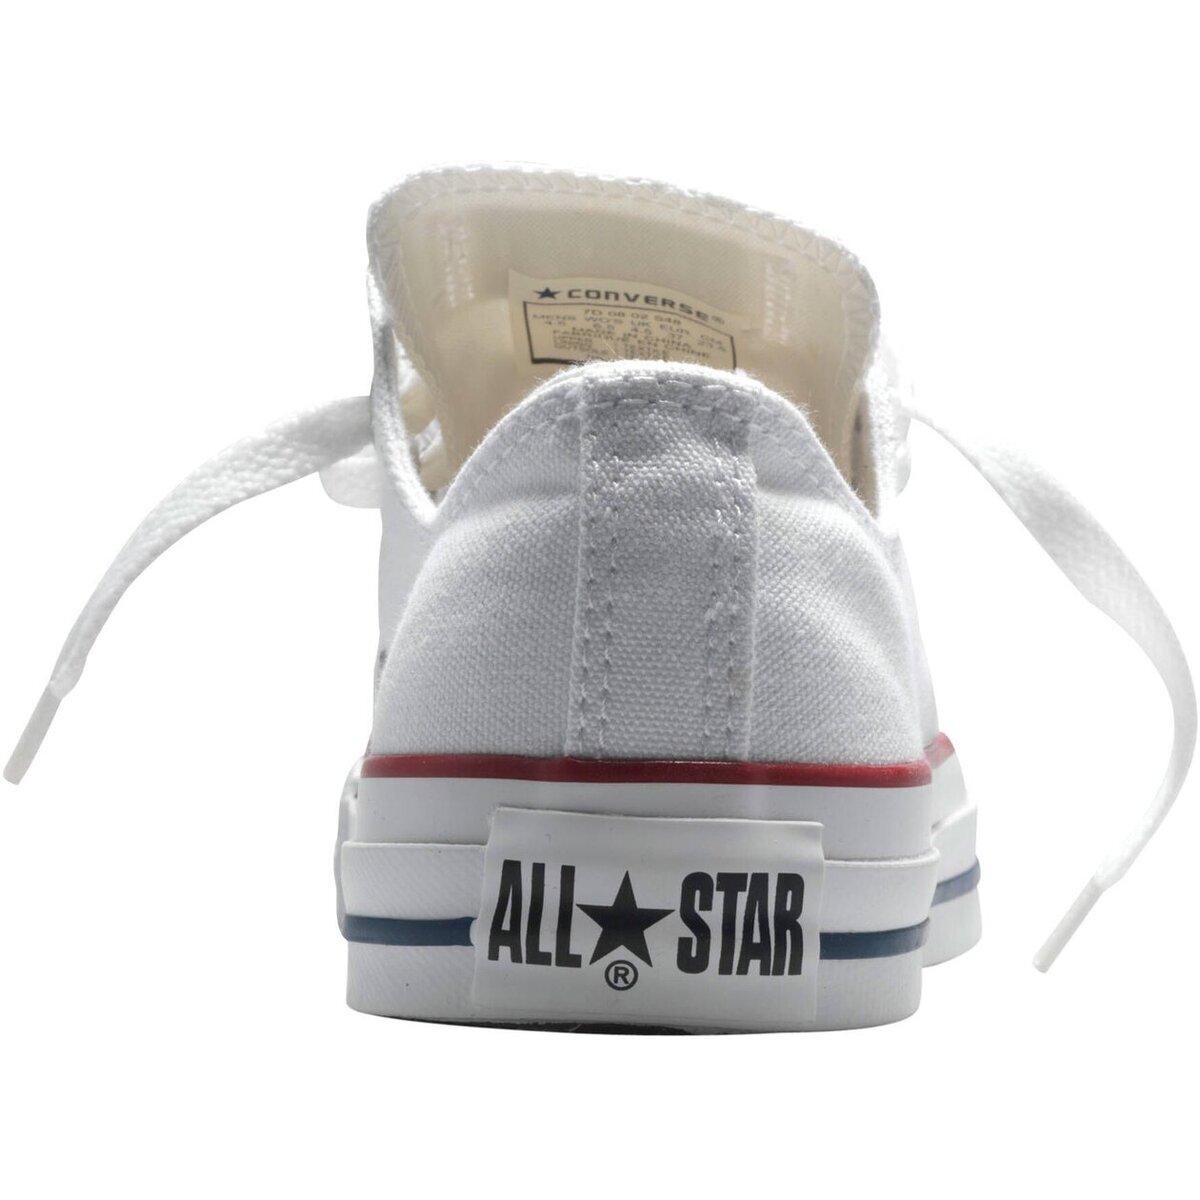 Bild 4 von CONVERSE Sneaker AS Core OX - optical white